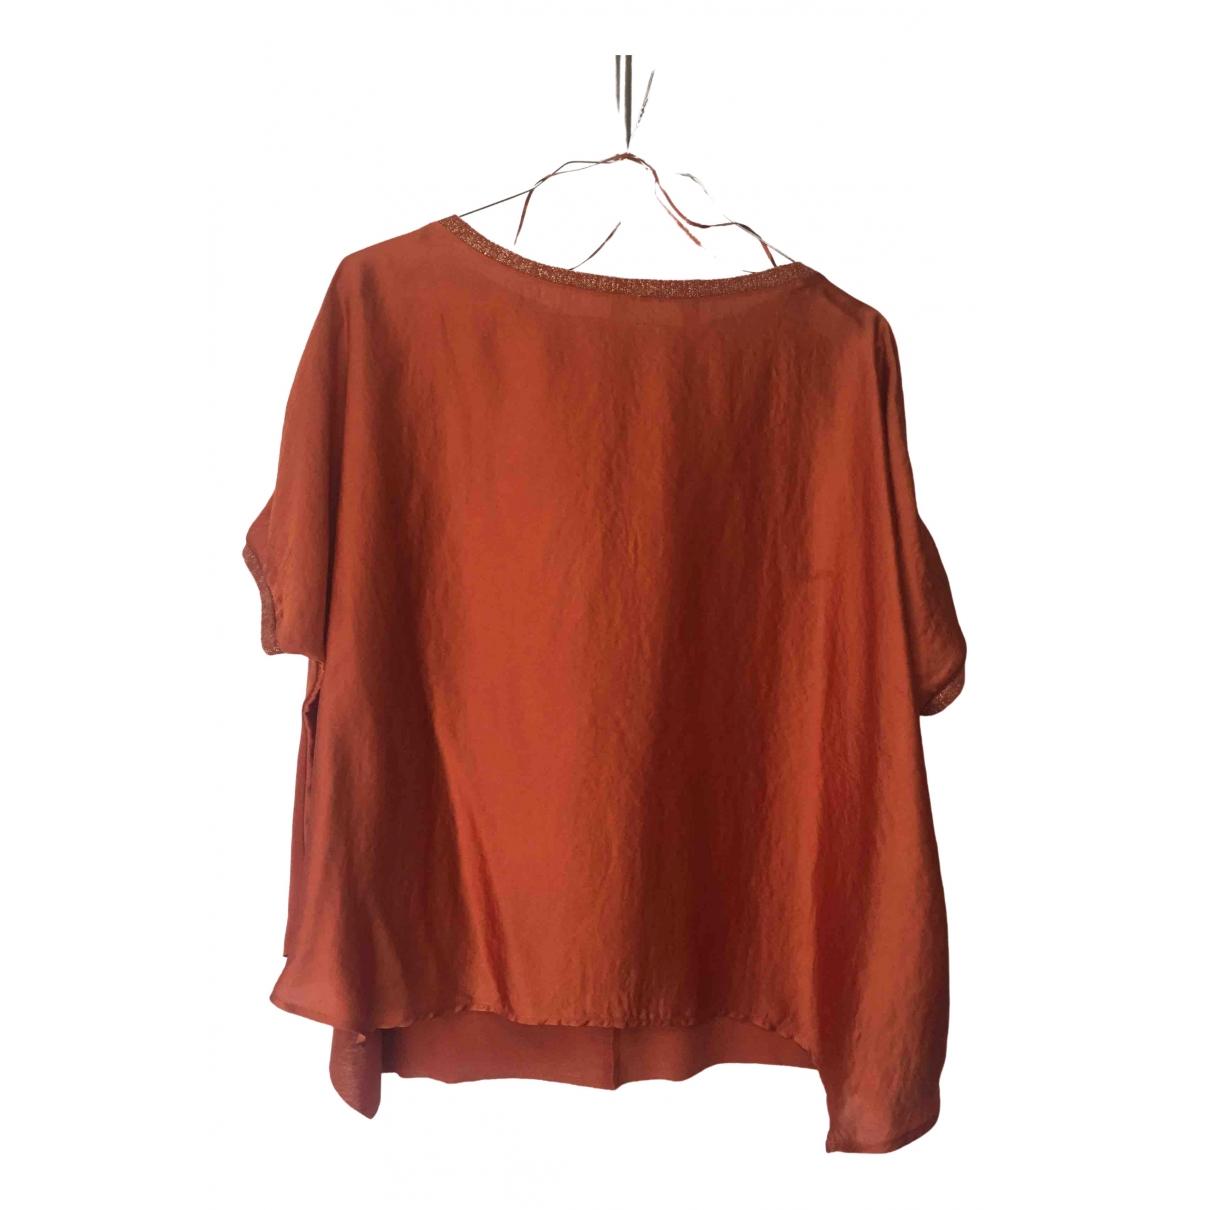 Zara - Top   pour femme - orange